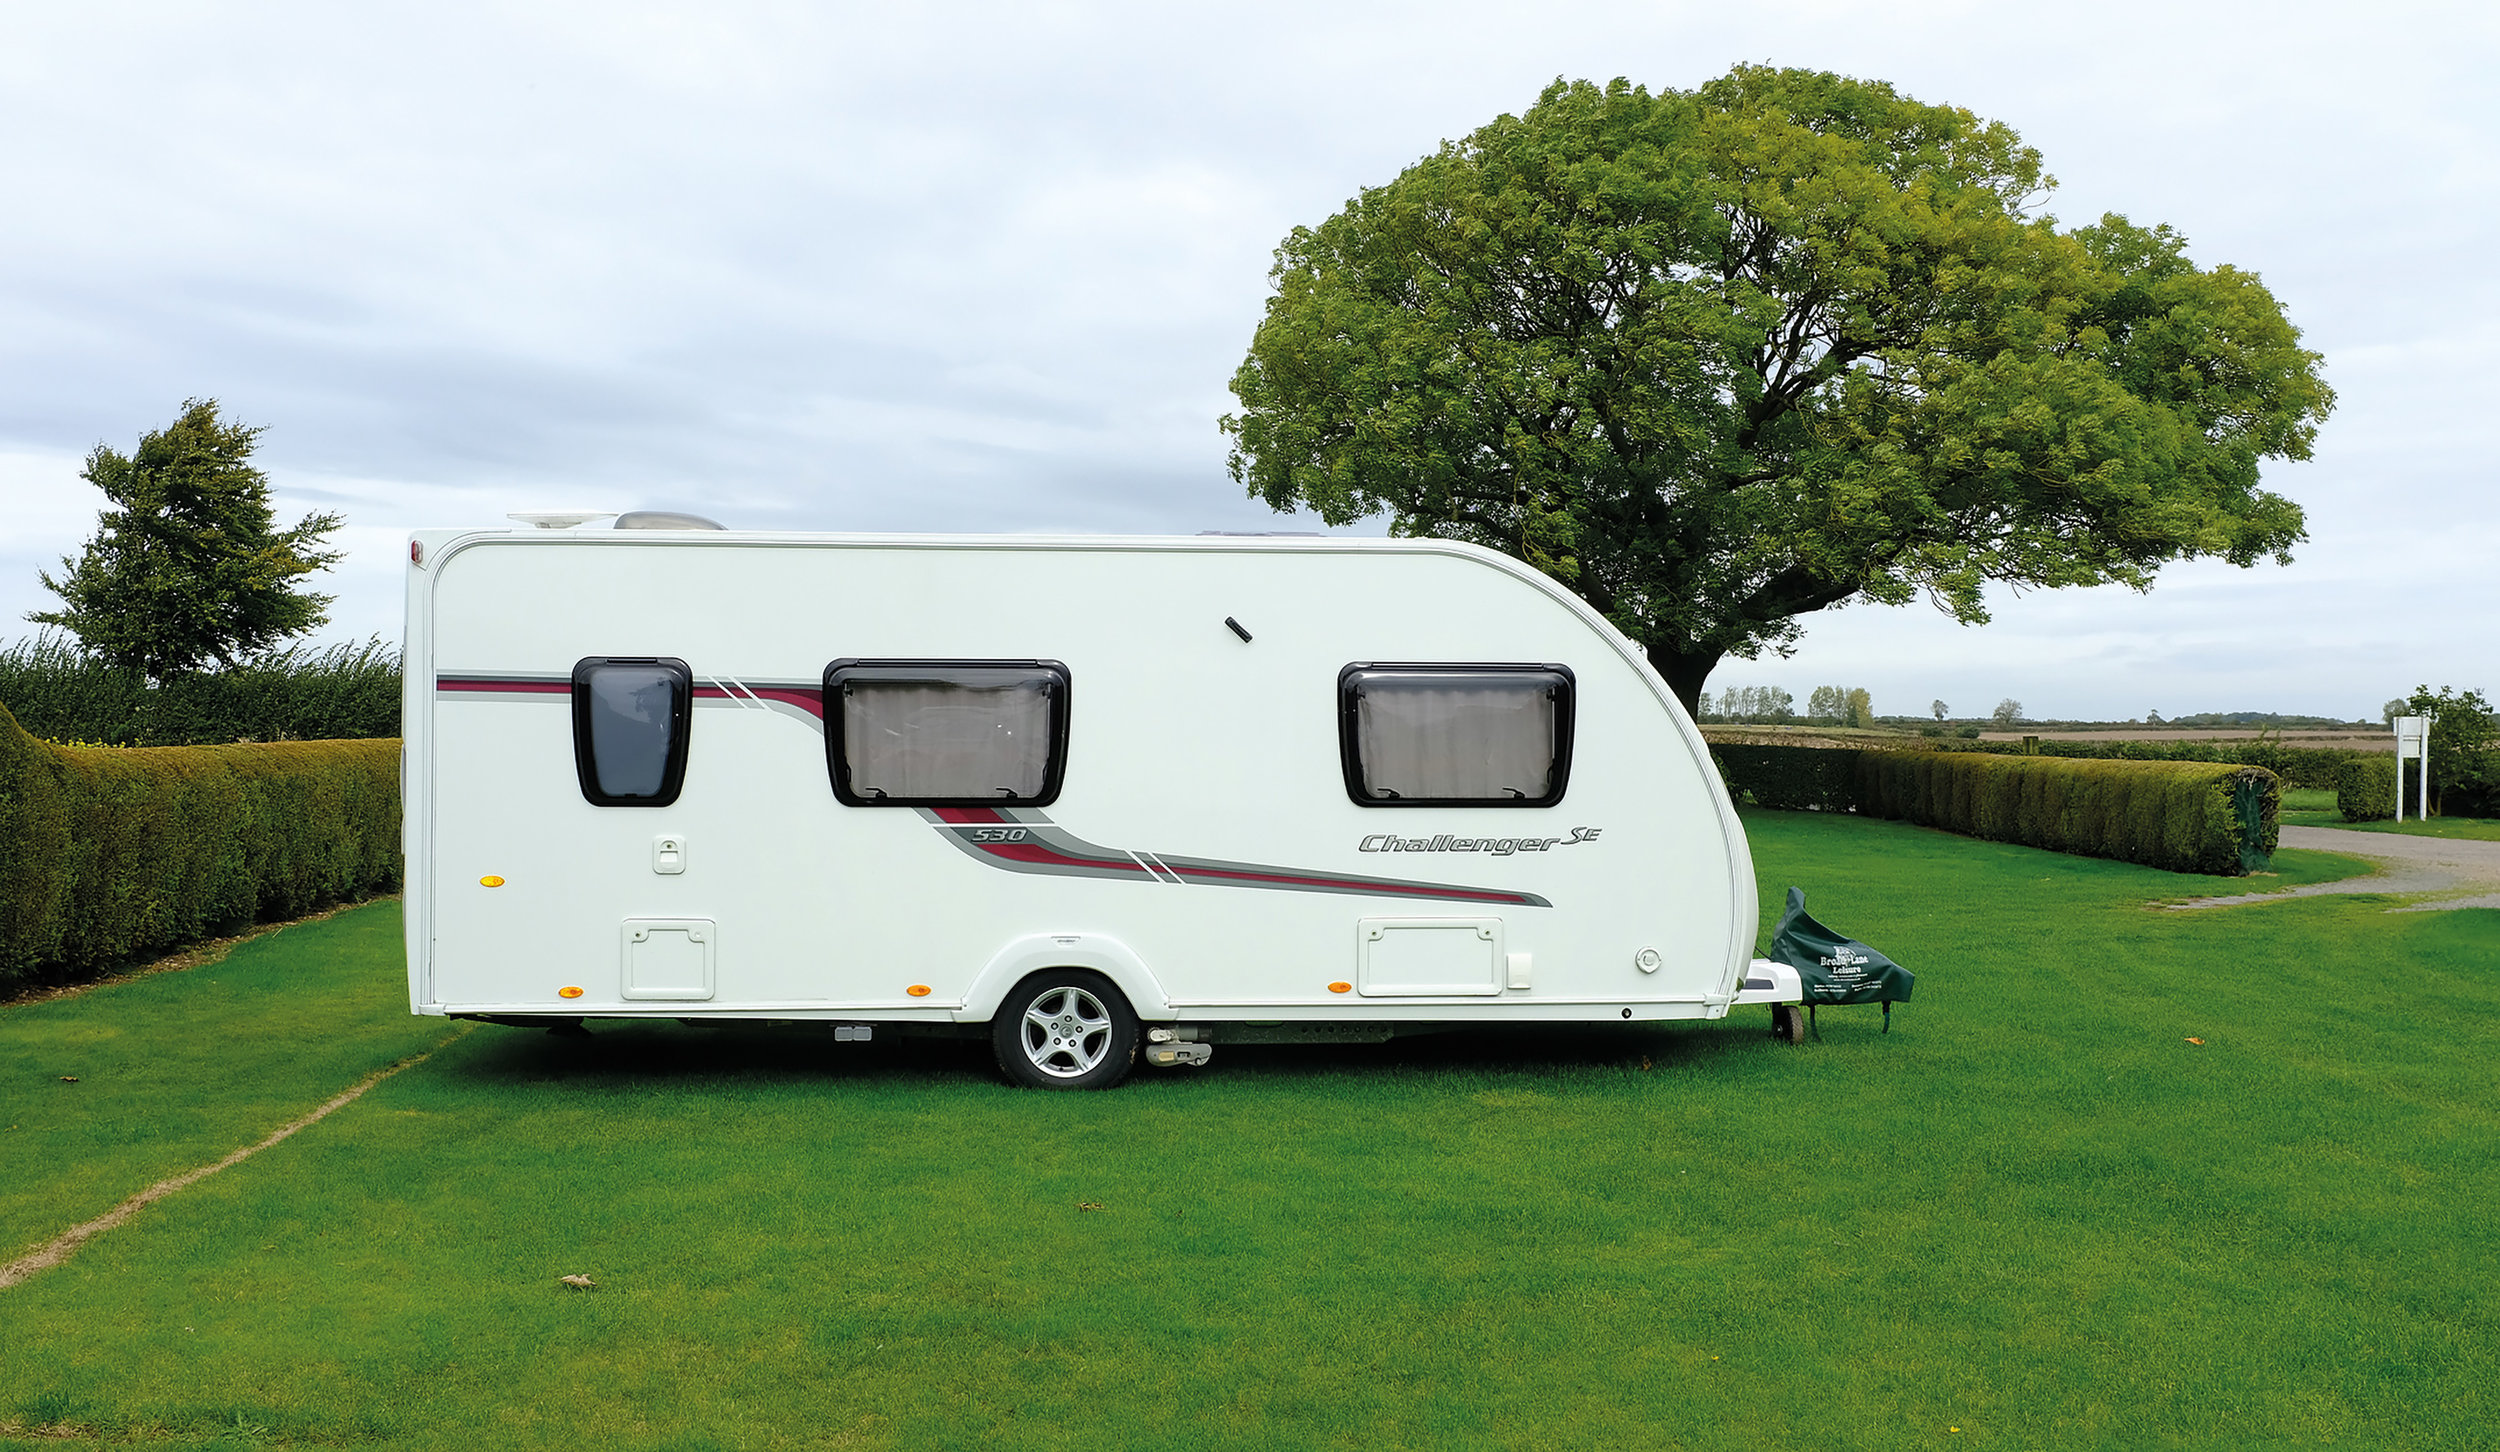 Heath-House-Caravan-Park_5738.jpg